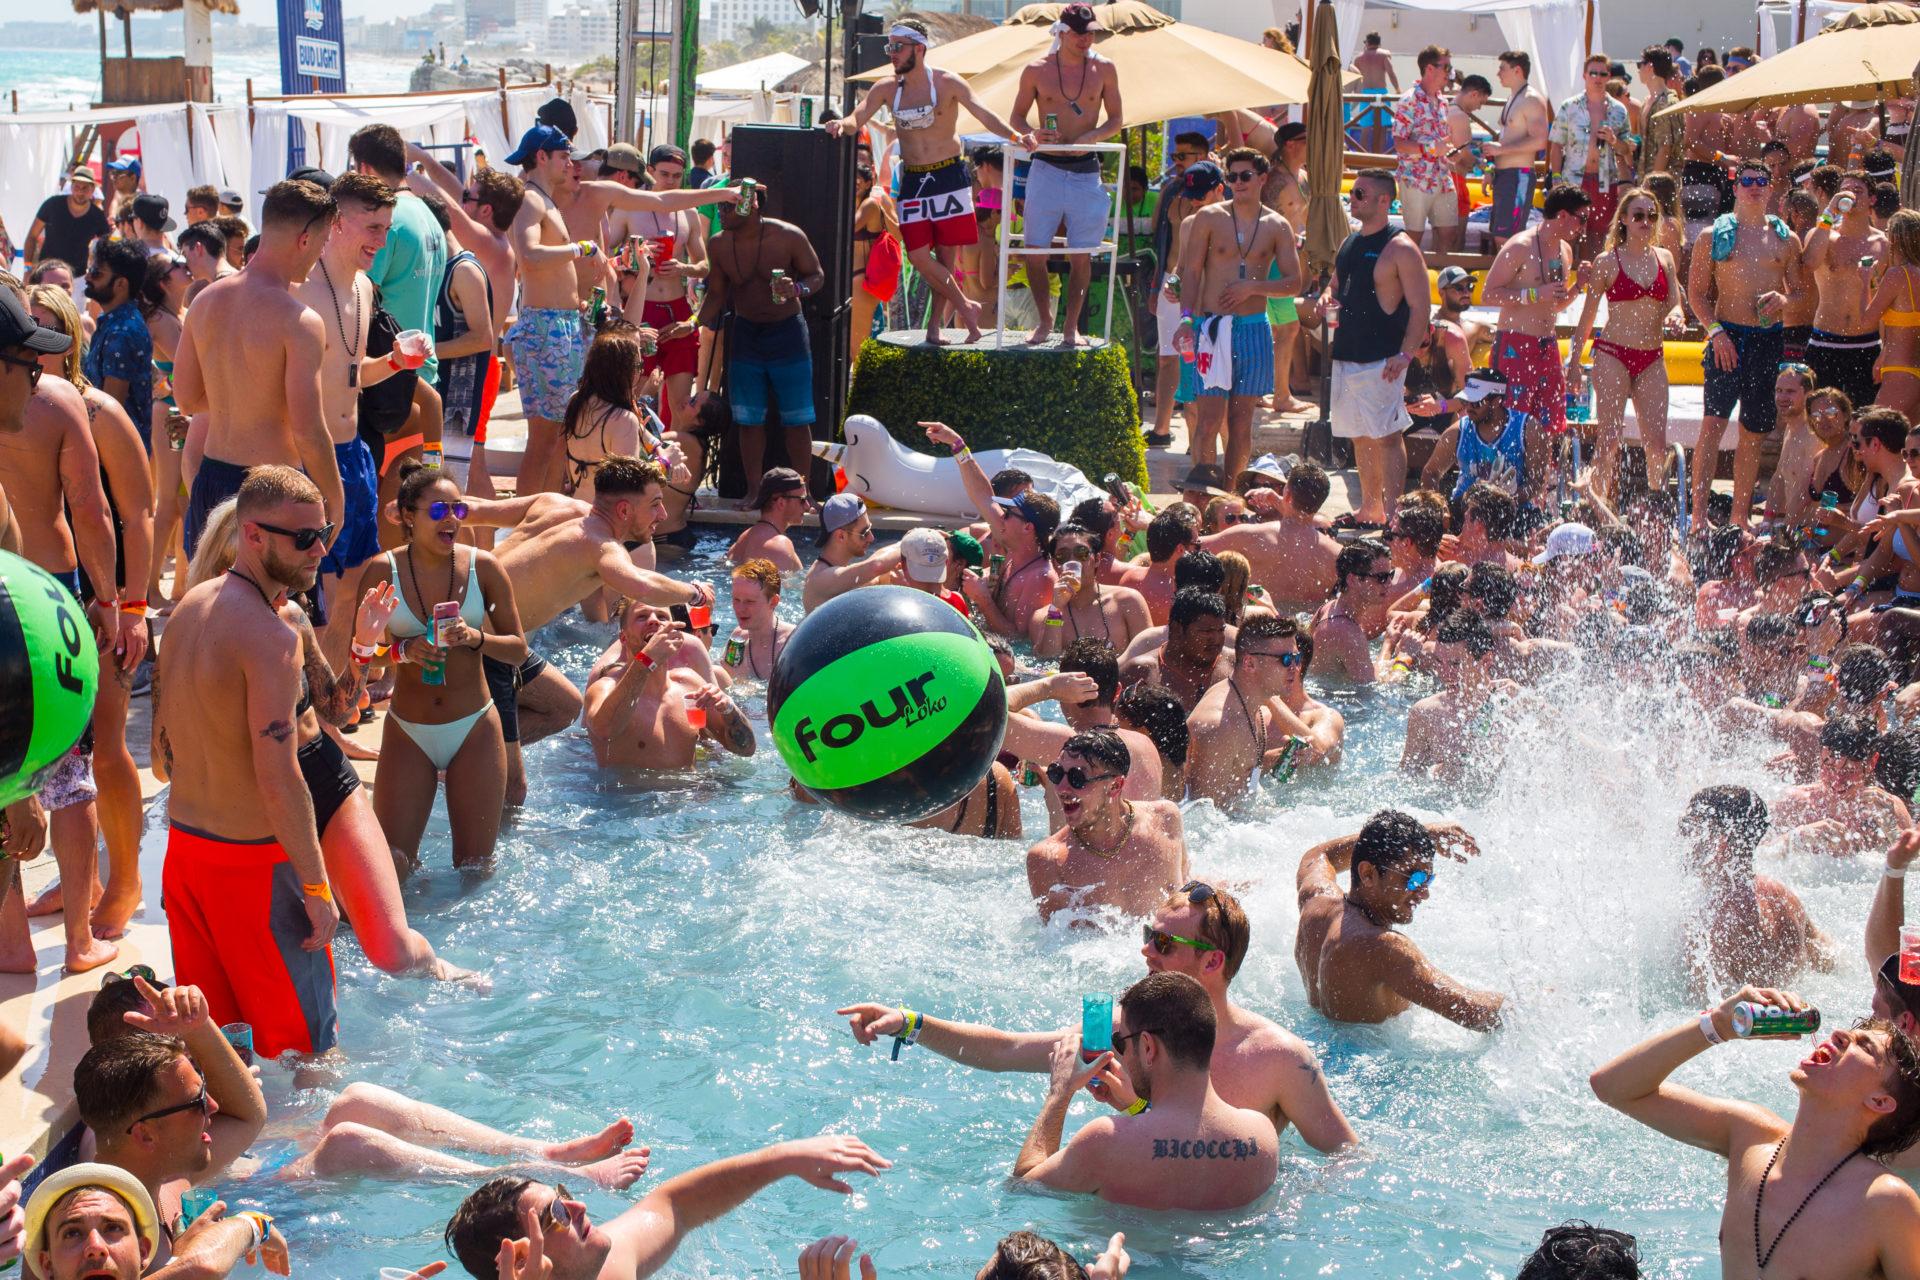 Party hotels spring break cancun